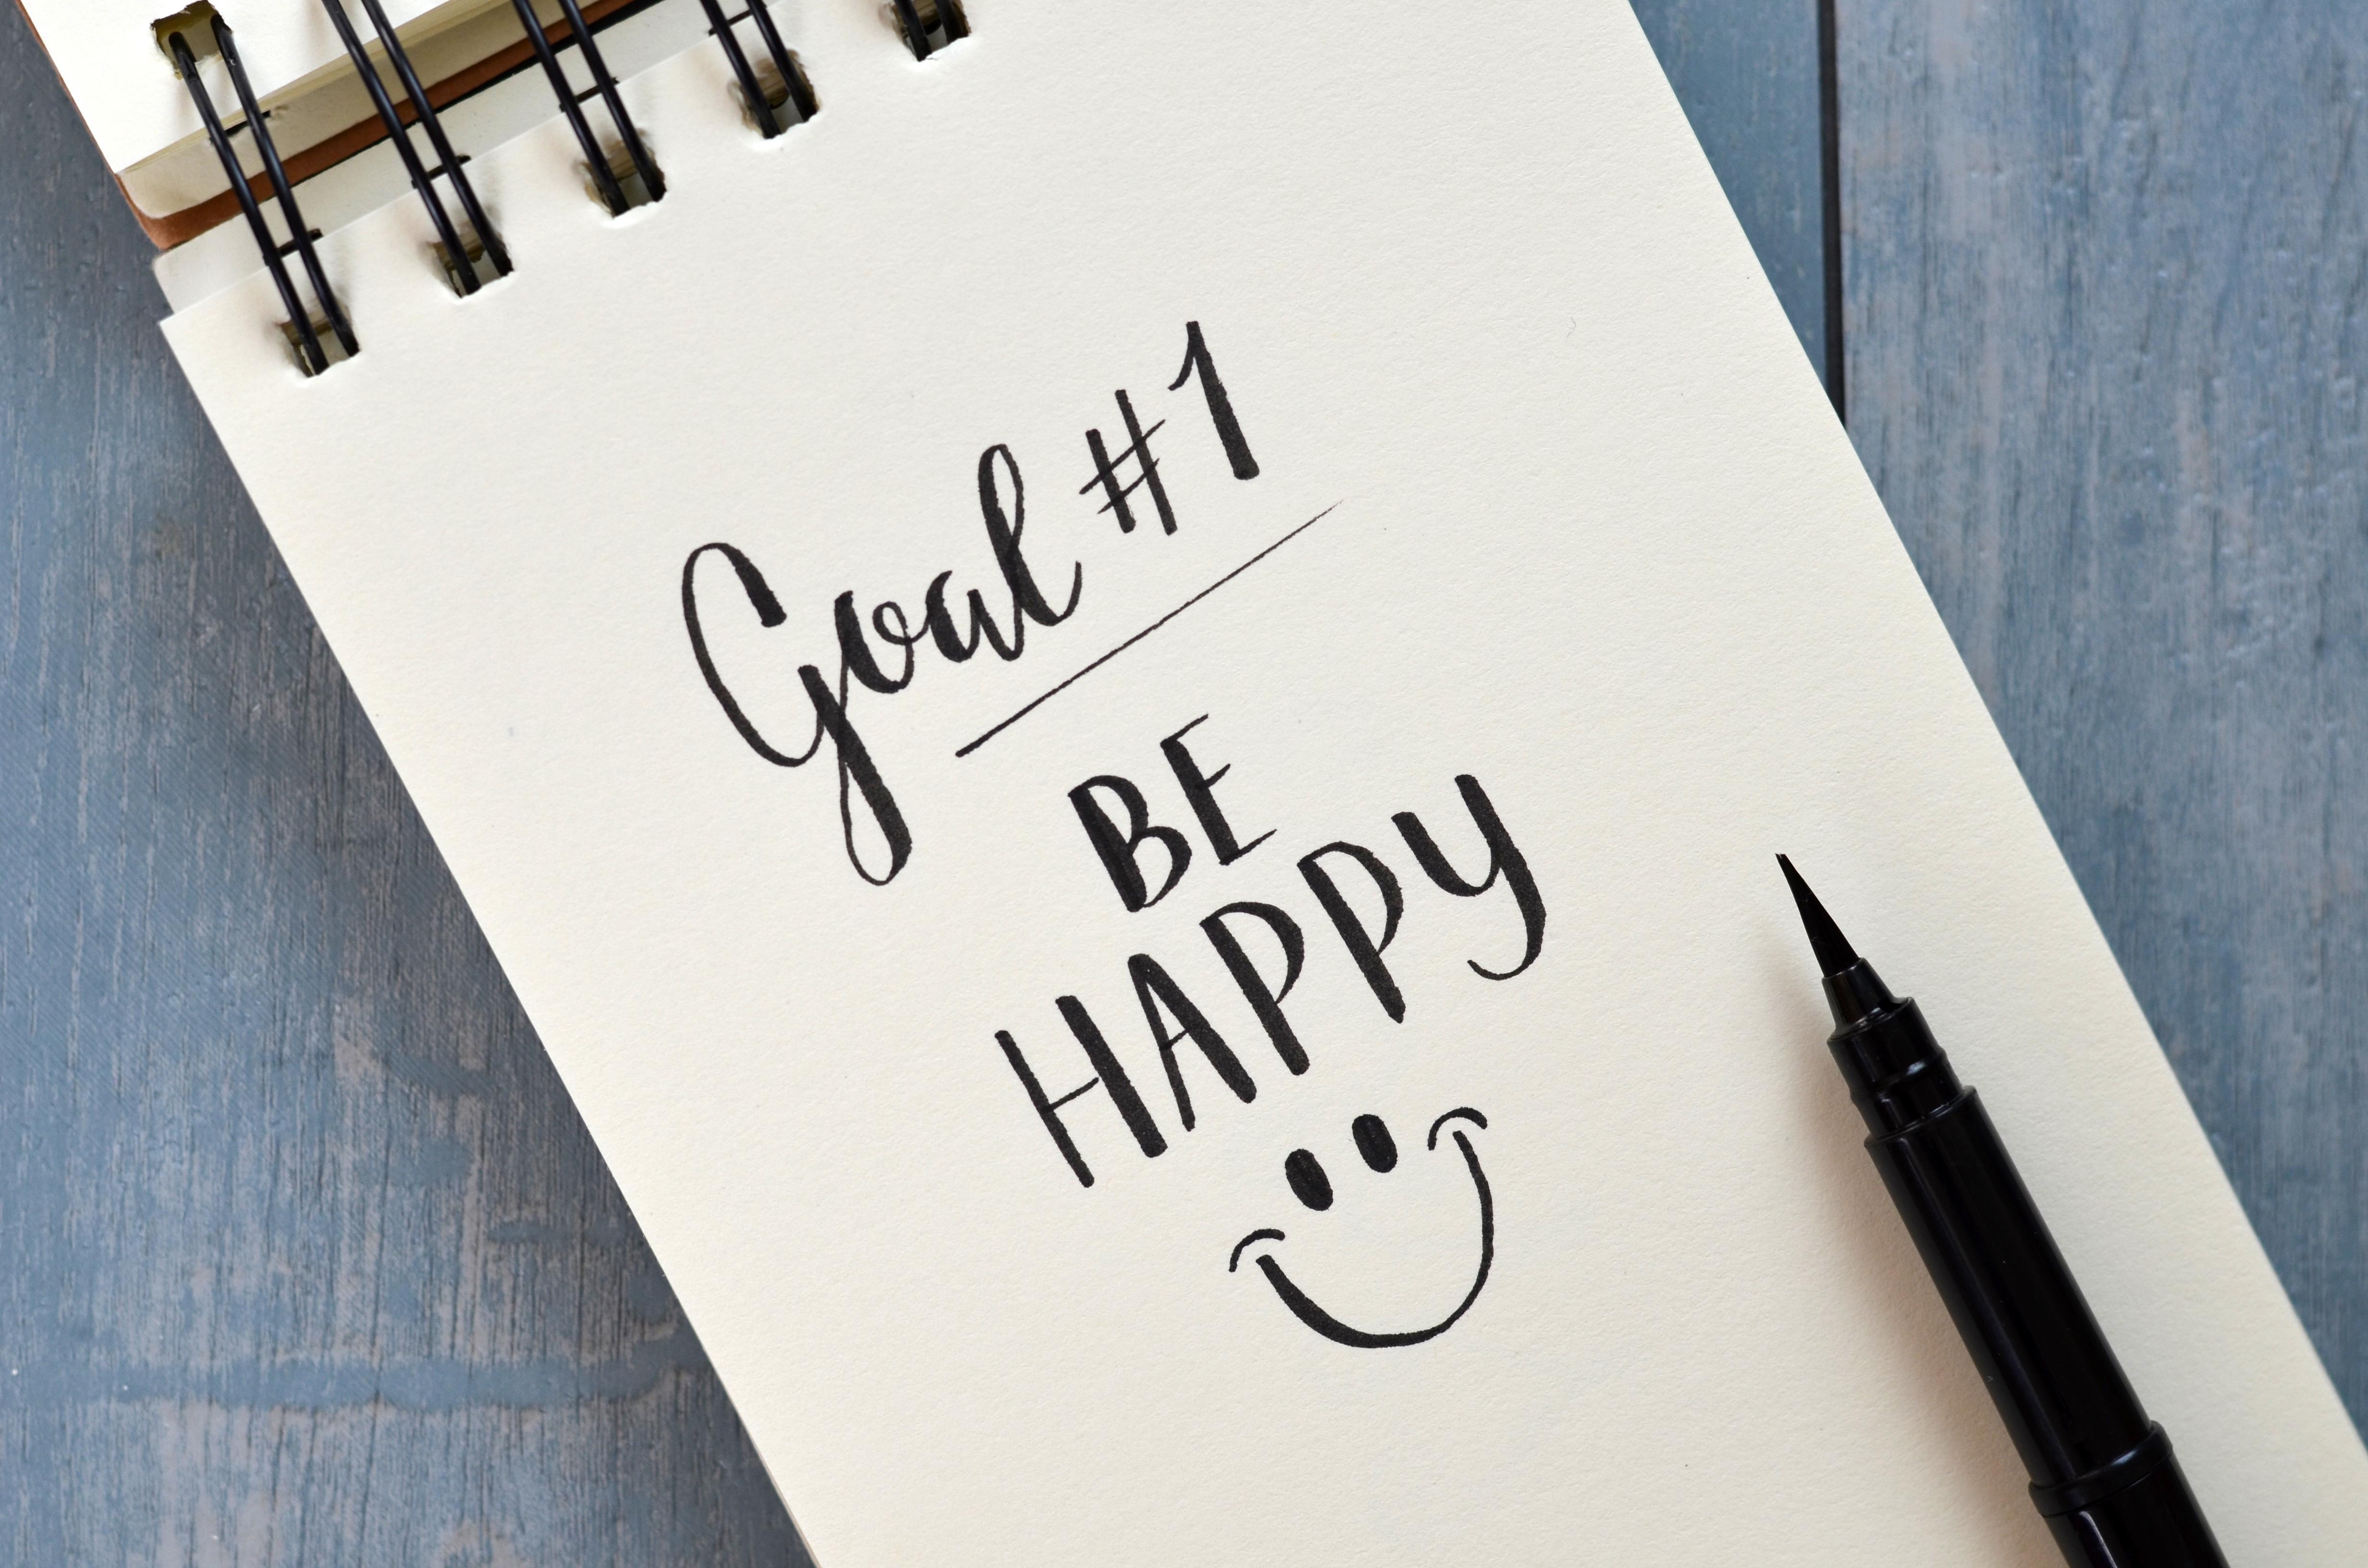 Benefits of a Gratitude Practice for Work